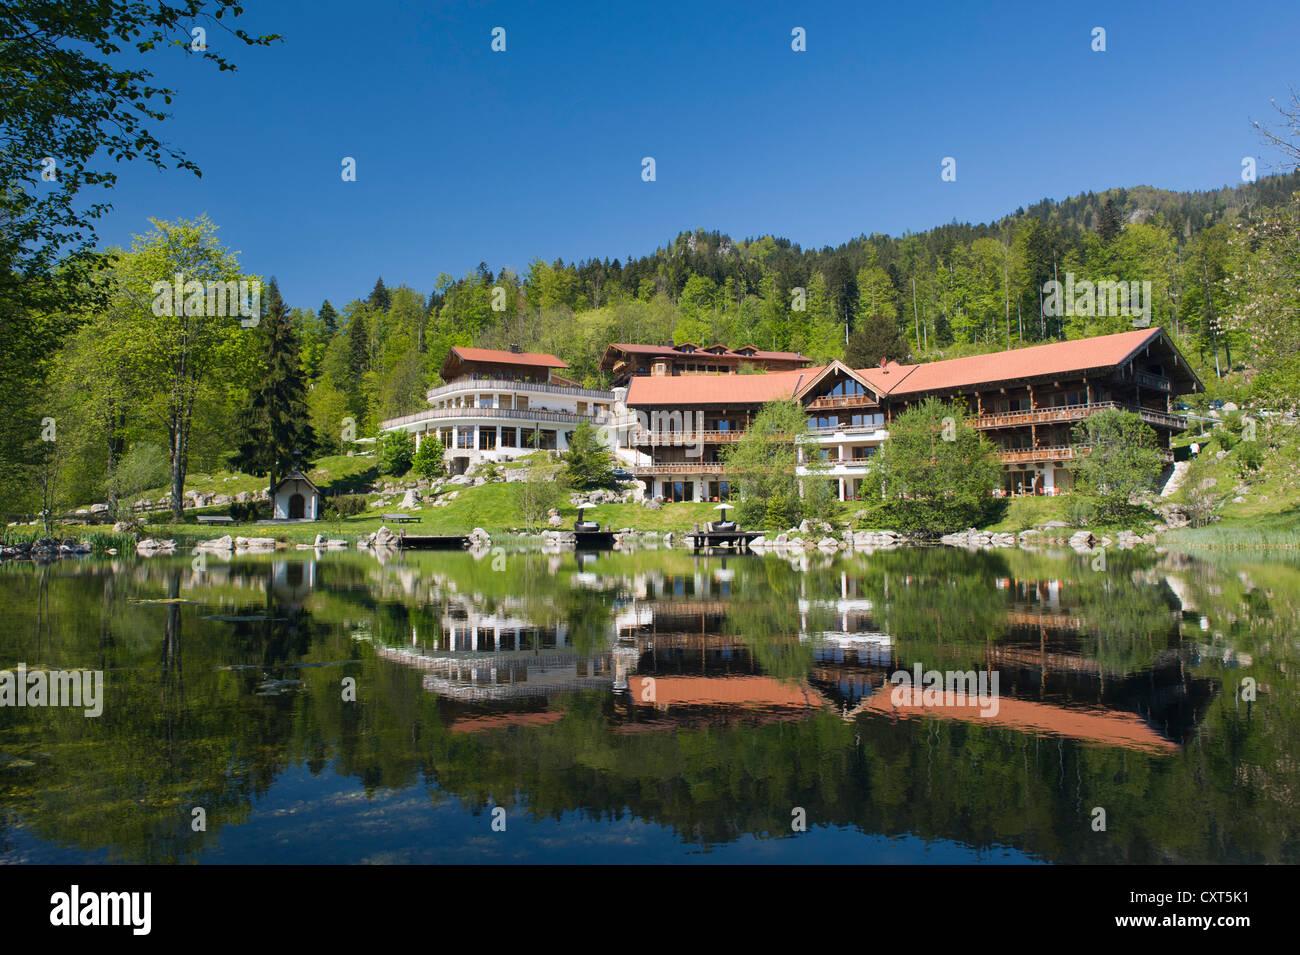 Hotel restaurant at Tatzelwurm lake, Bavarian Alps, Upper Bavaria, Bavaria, Germany, Europe - Stock Image